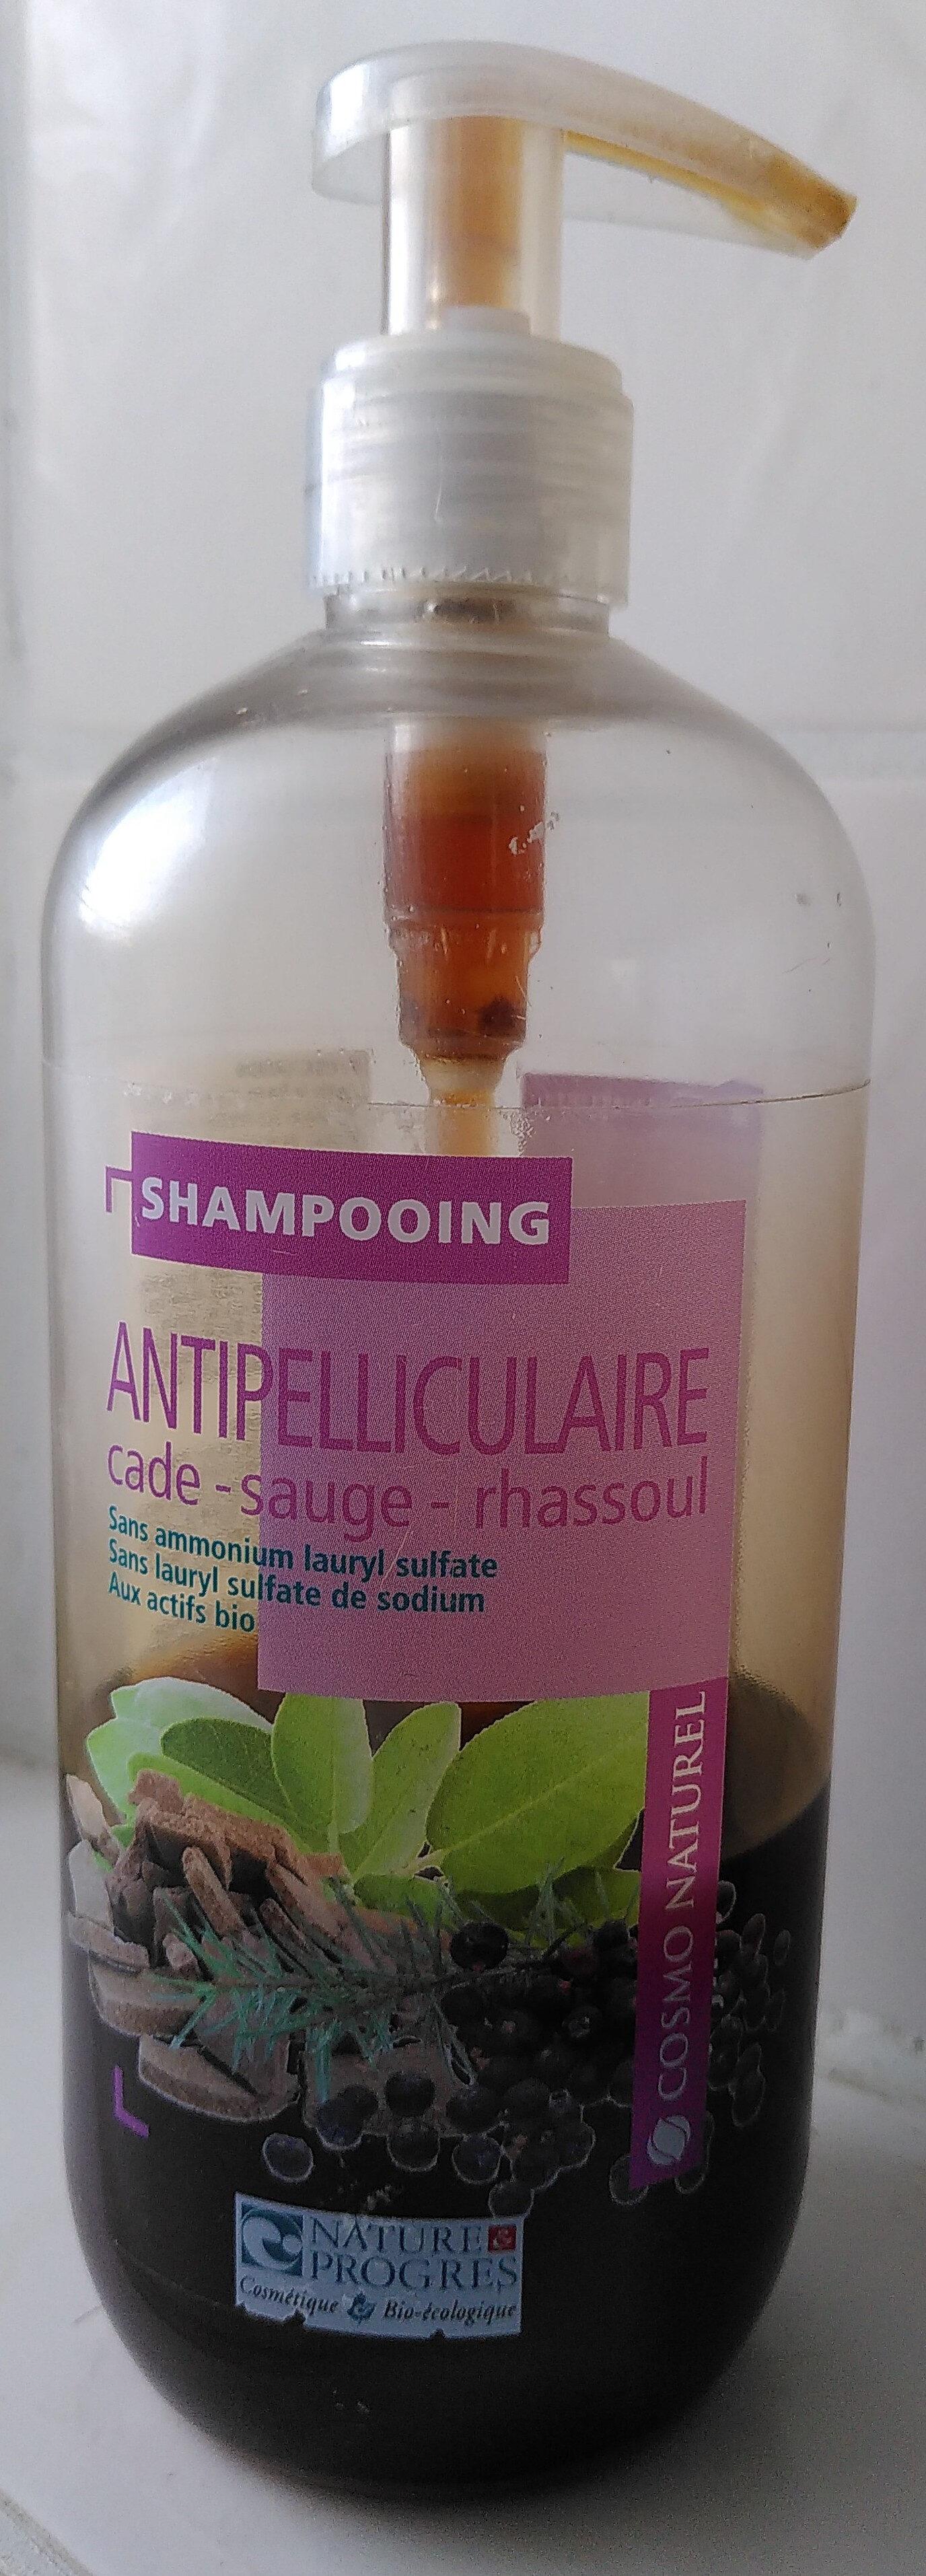 Shampooing antipelliculaire  cade-sauge-rhassoul - Produit